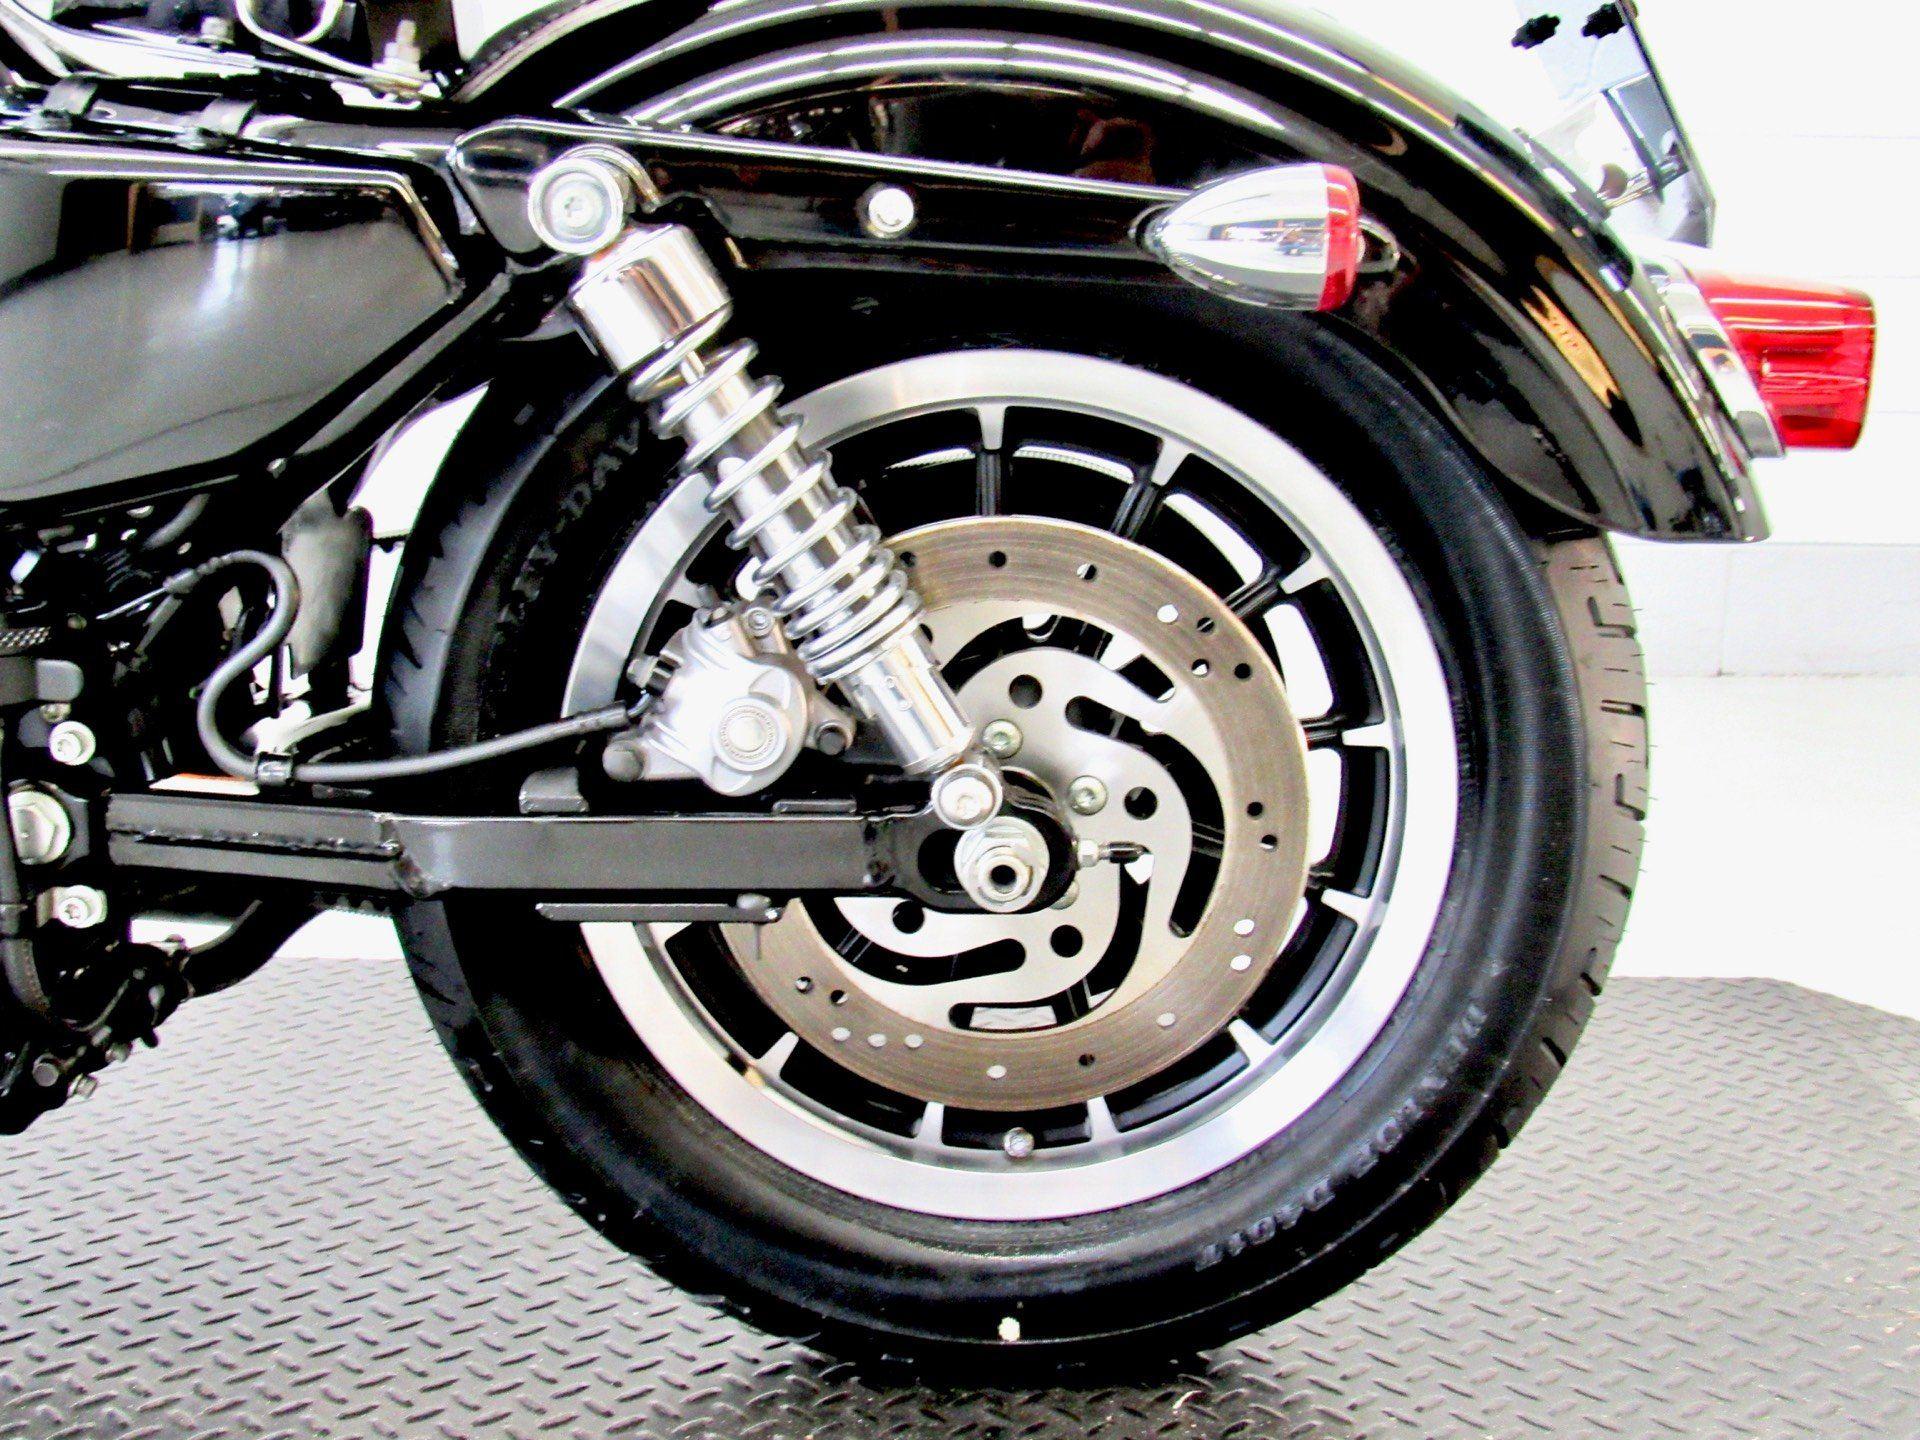 2009 Harley-Davidson Sportster 1200 Low in Fredericksburg, Virginia